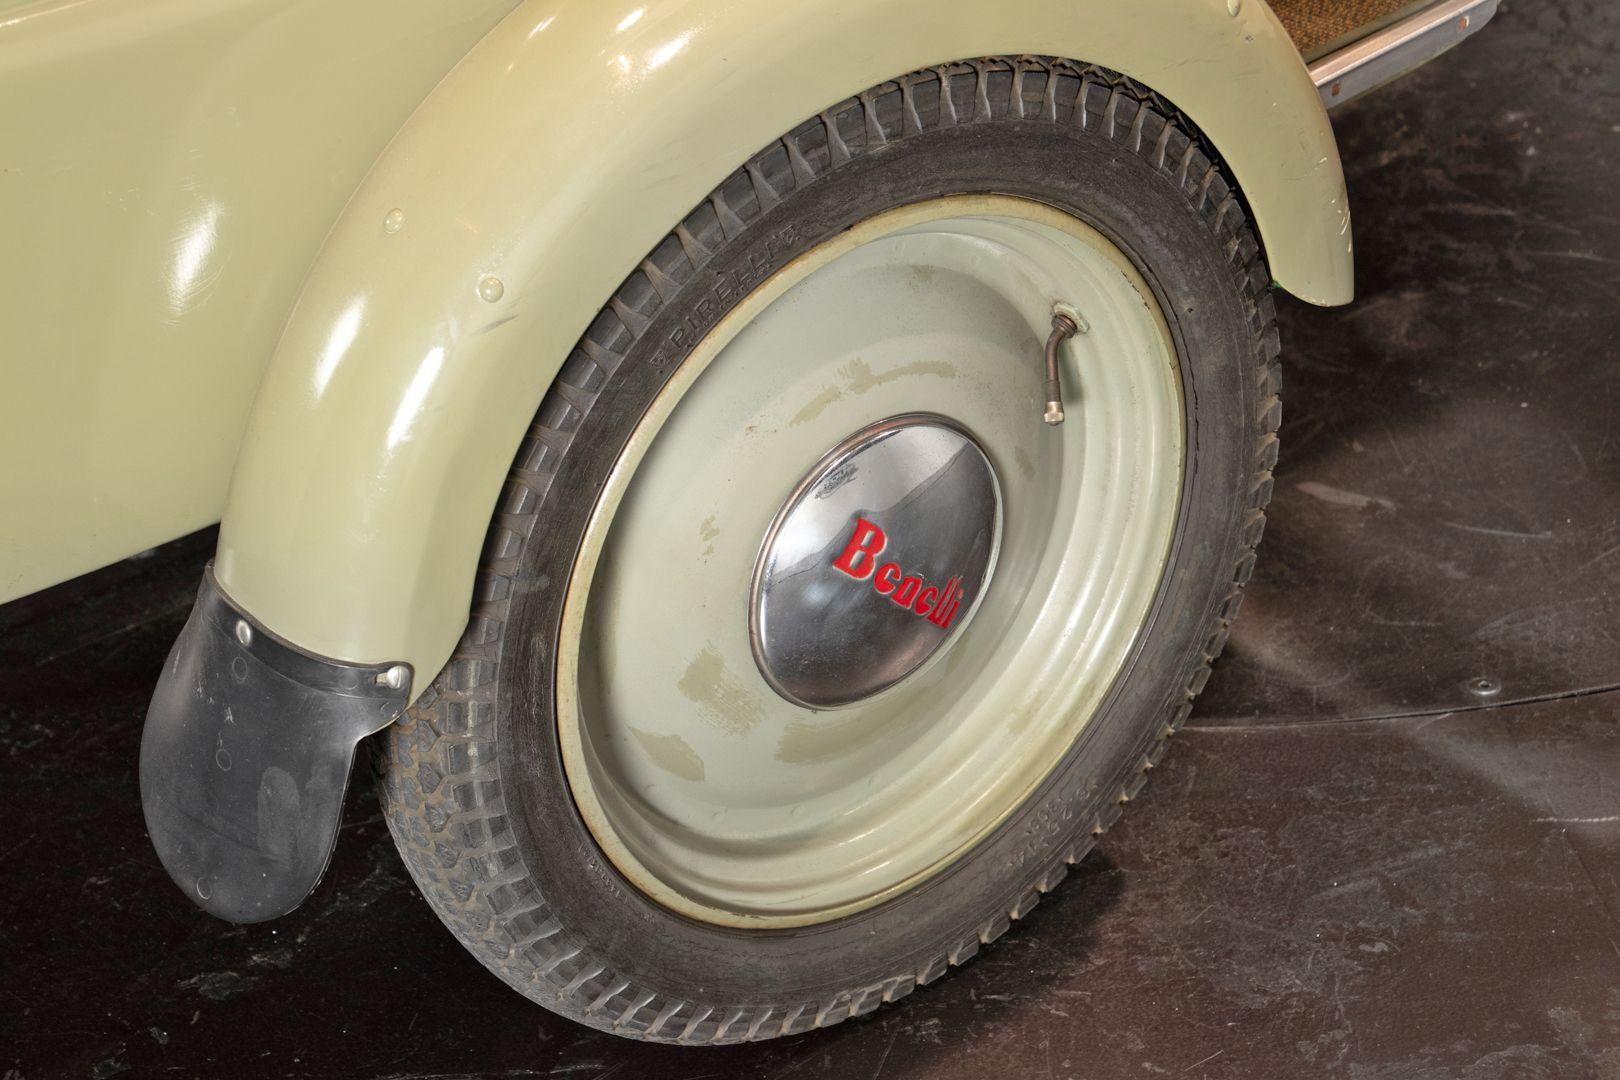 1956 Benelli 125 Leoncino Rikshaws 74333